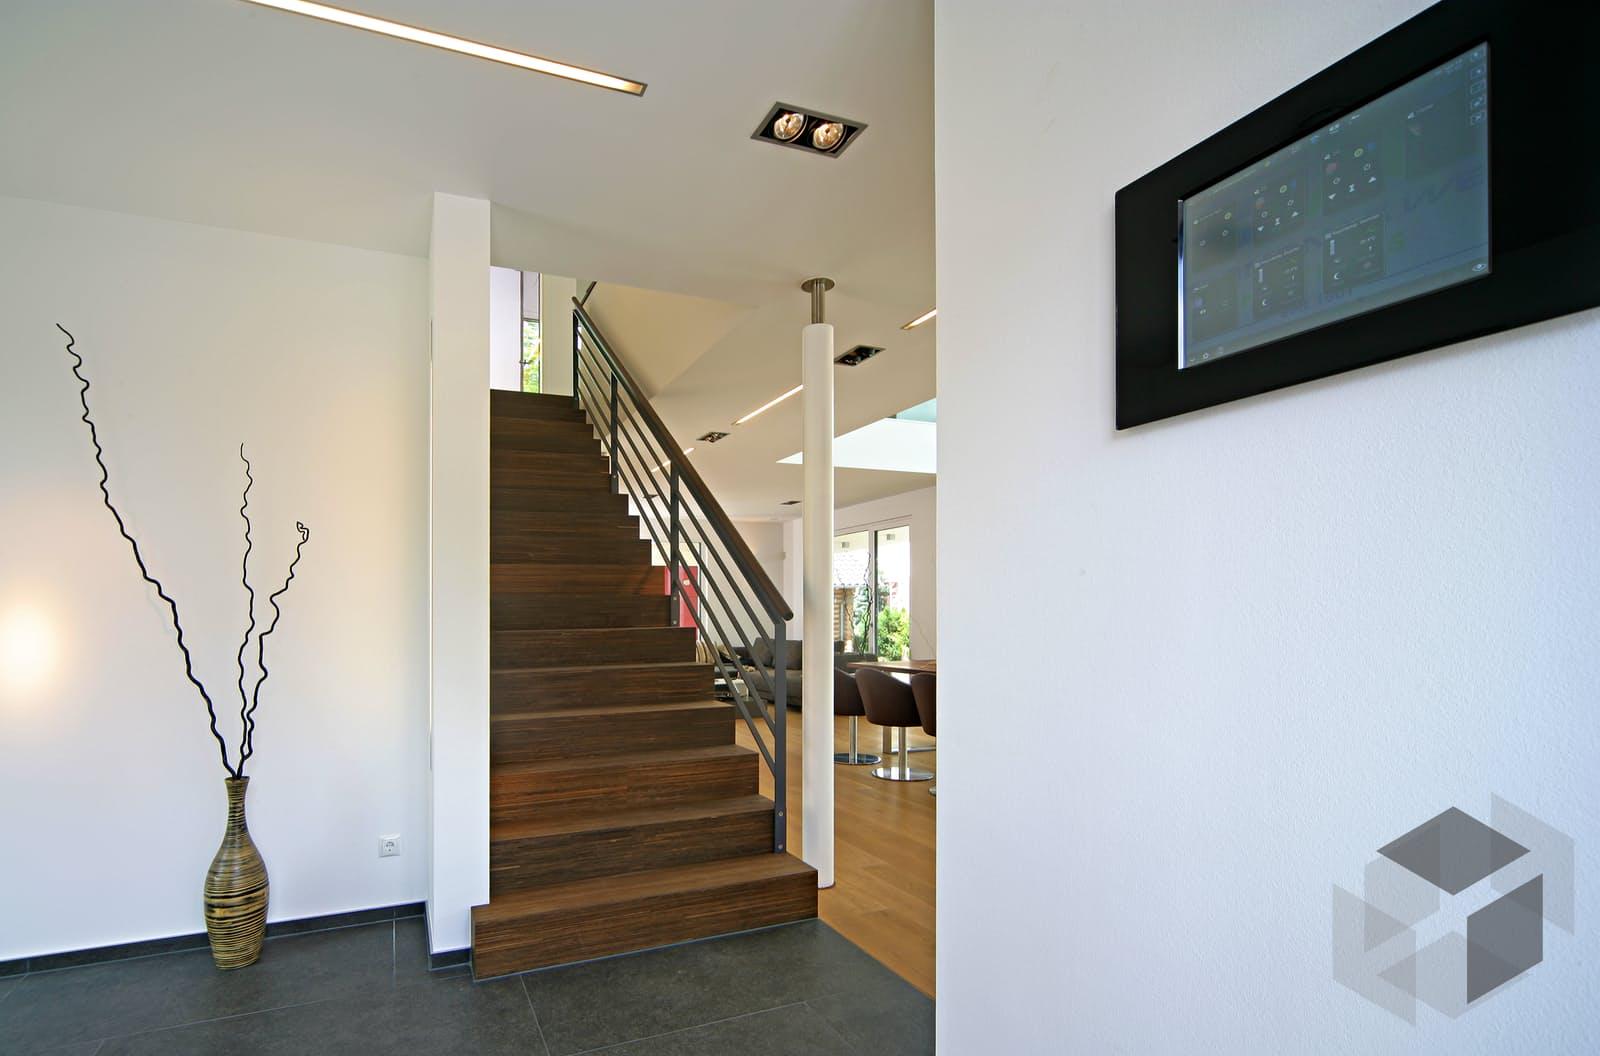 aktionshaus vital182 inactive von bittermann weiss. Black Bedroom Furniture Sets. Home Design Ideas